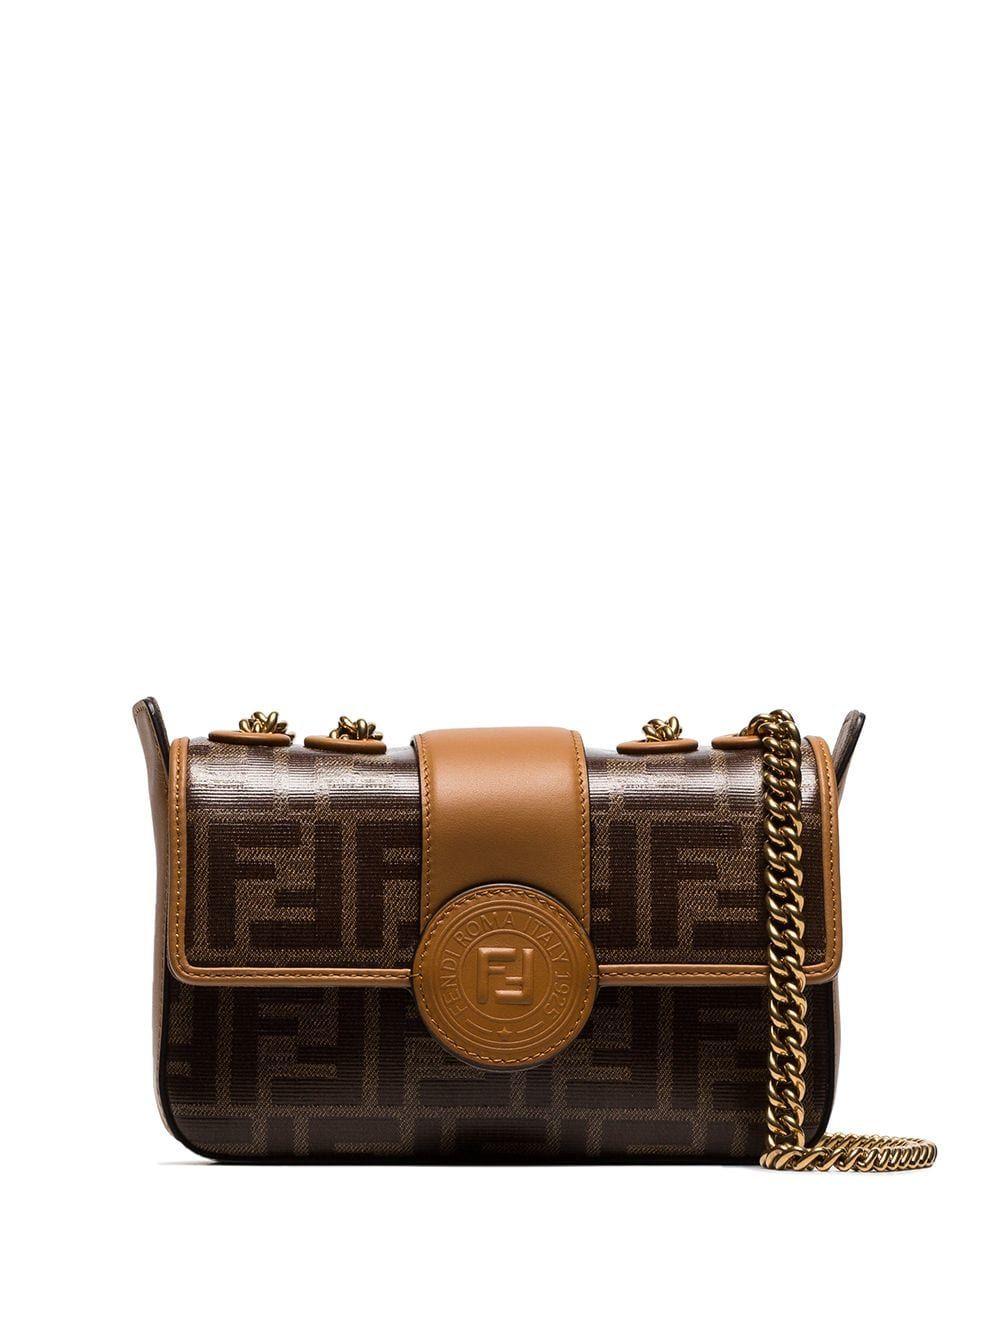 6a58b110345d Fendi brown FF logo leather camera bag